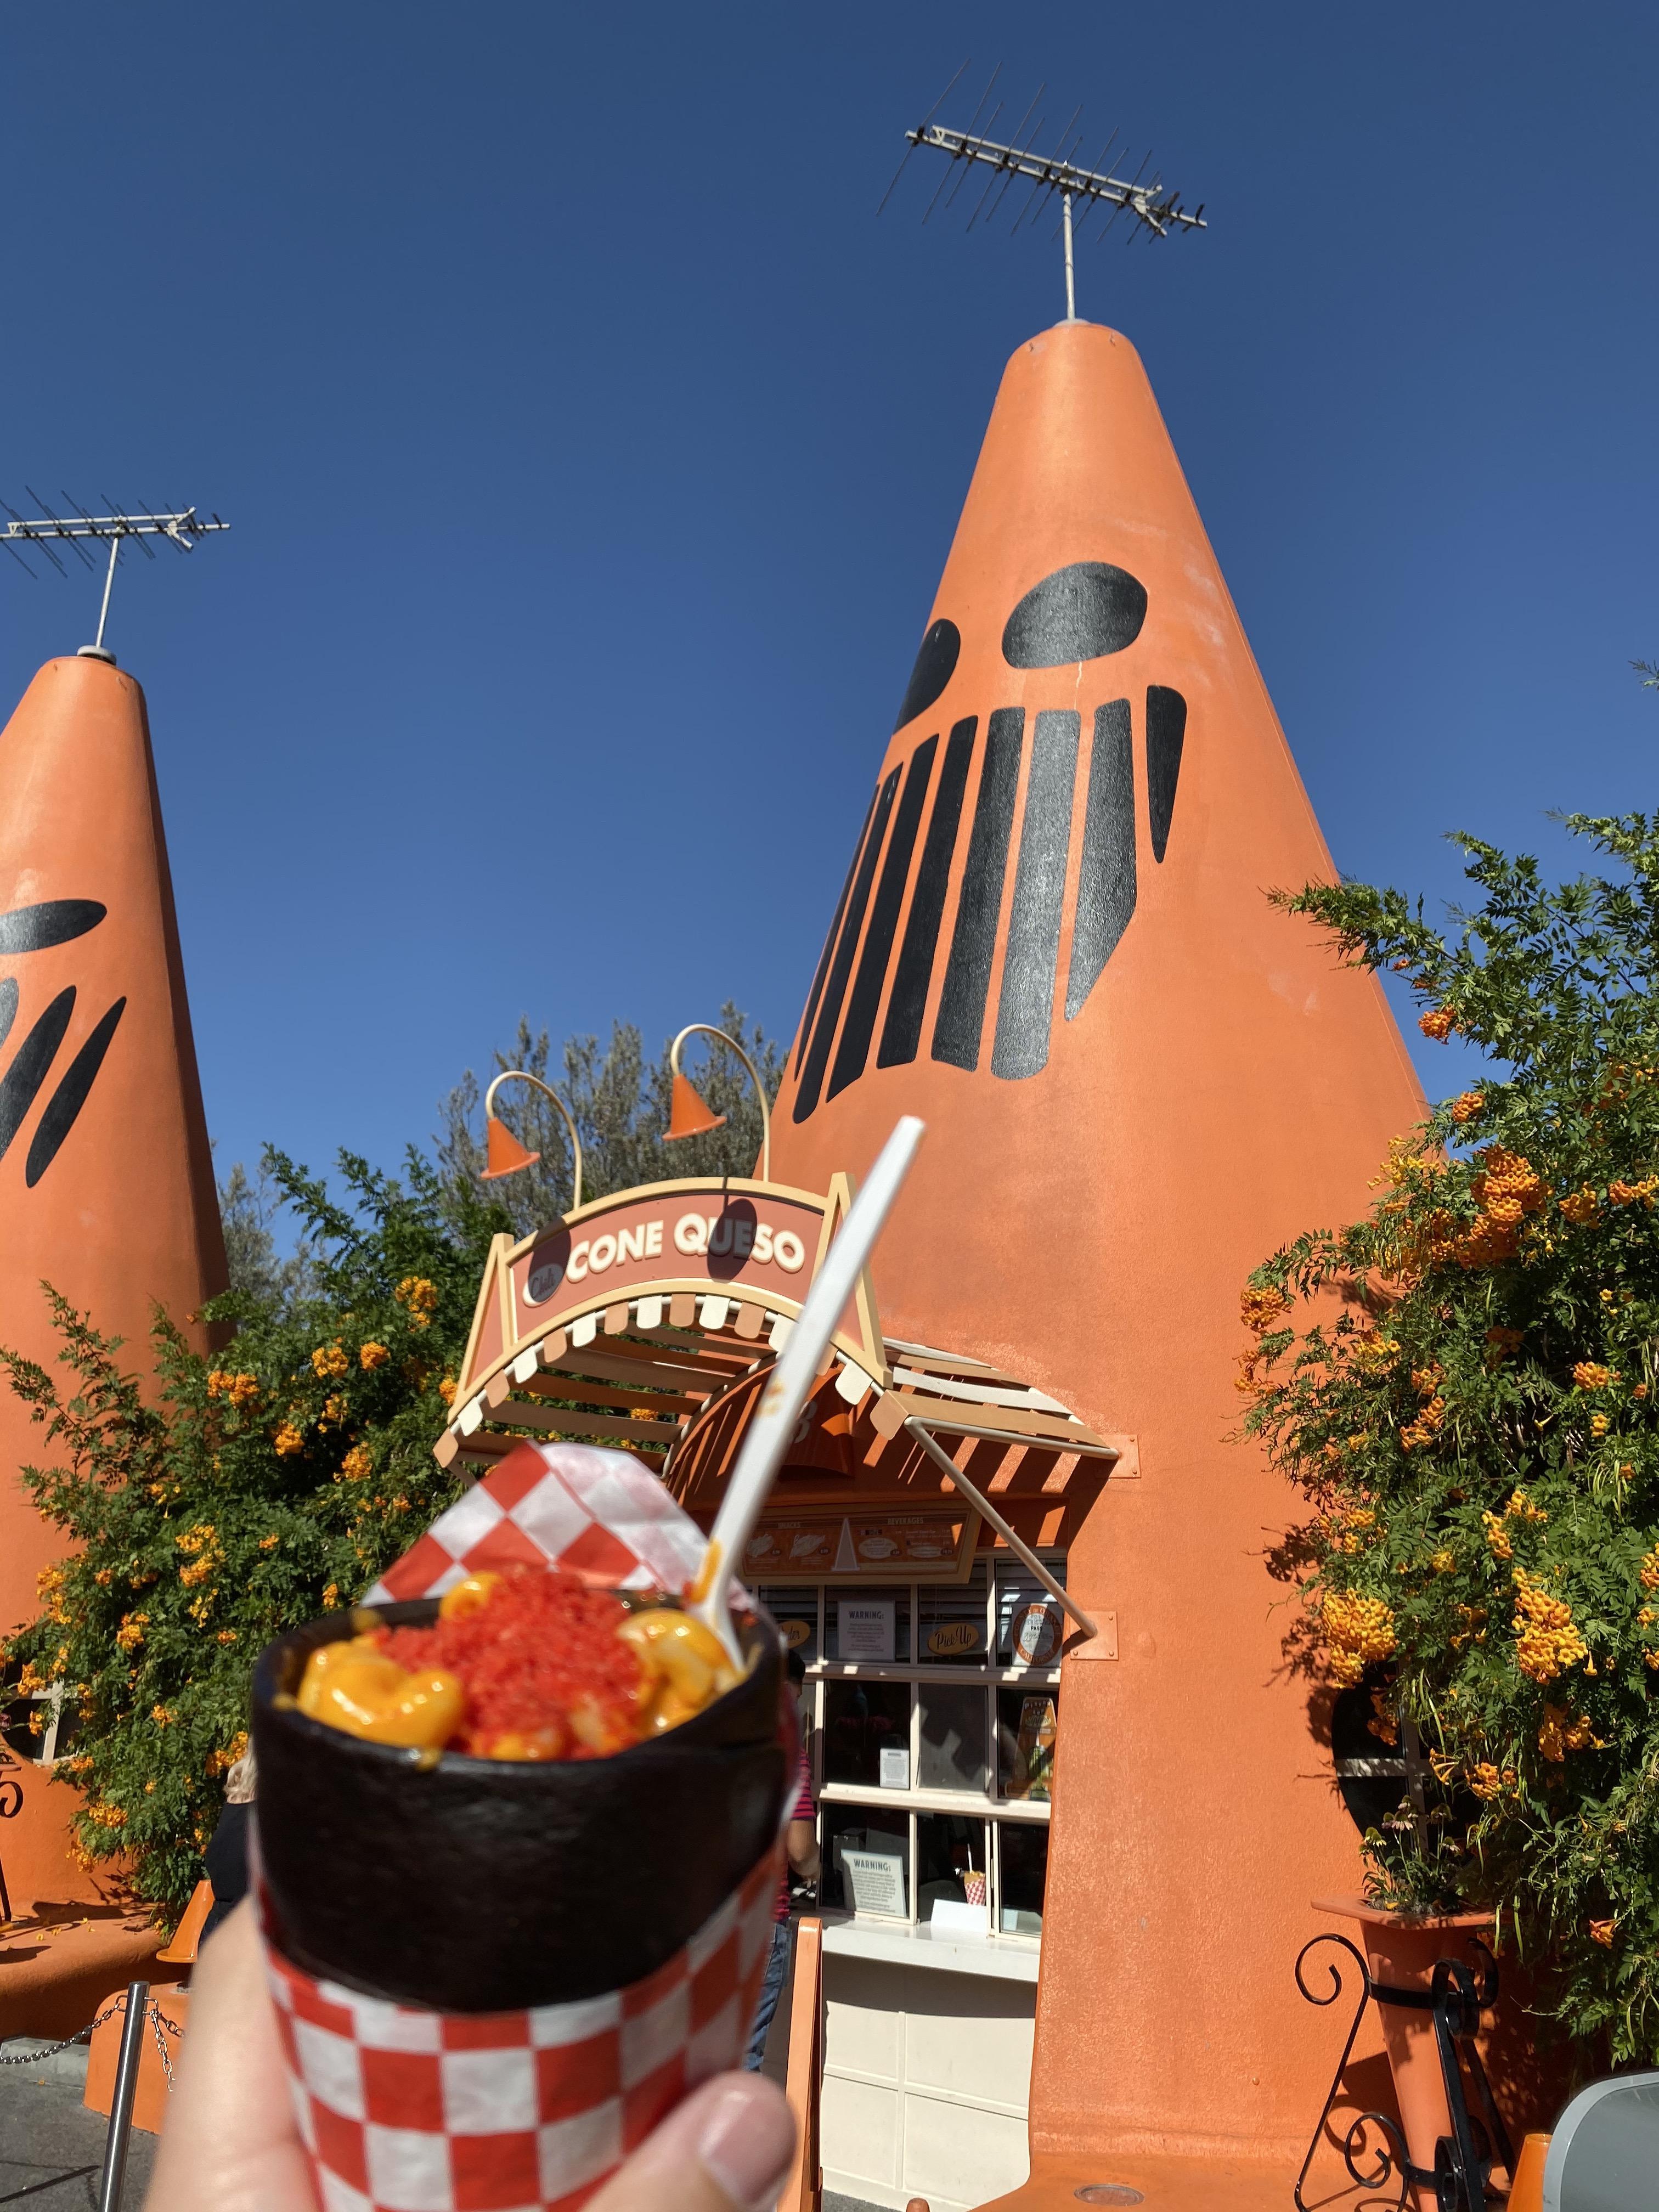 Disneyland Slow Burnin' Mac and Cheese Cone